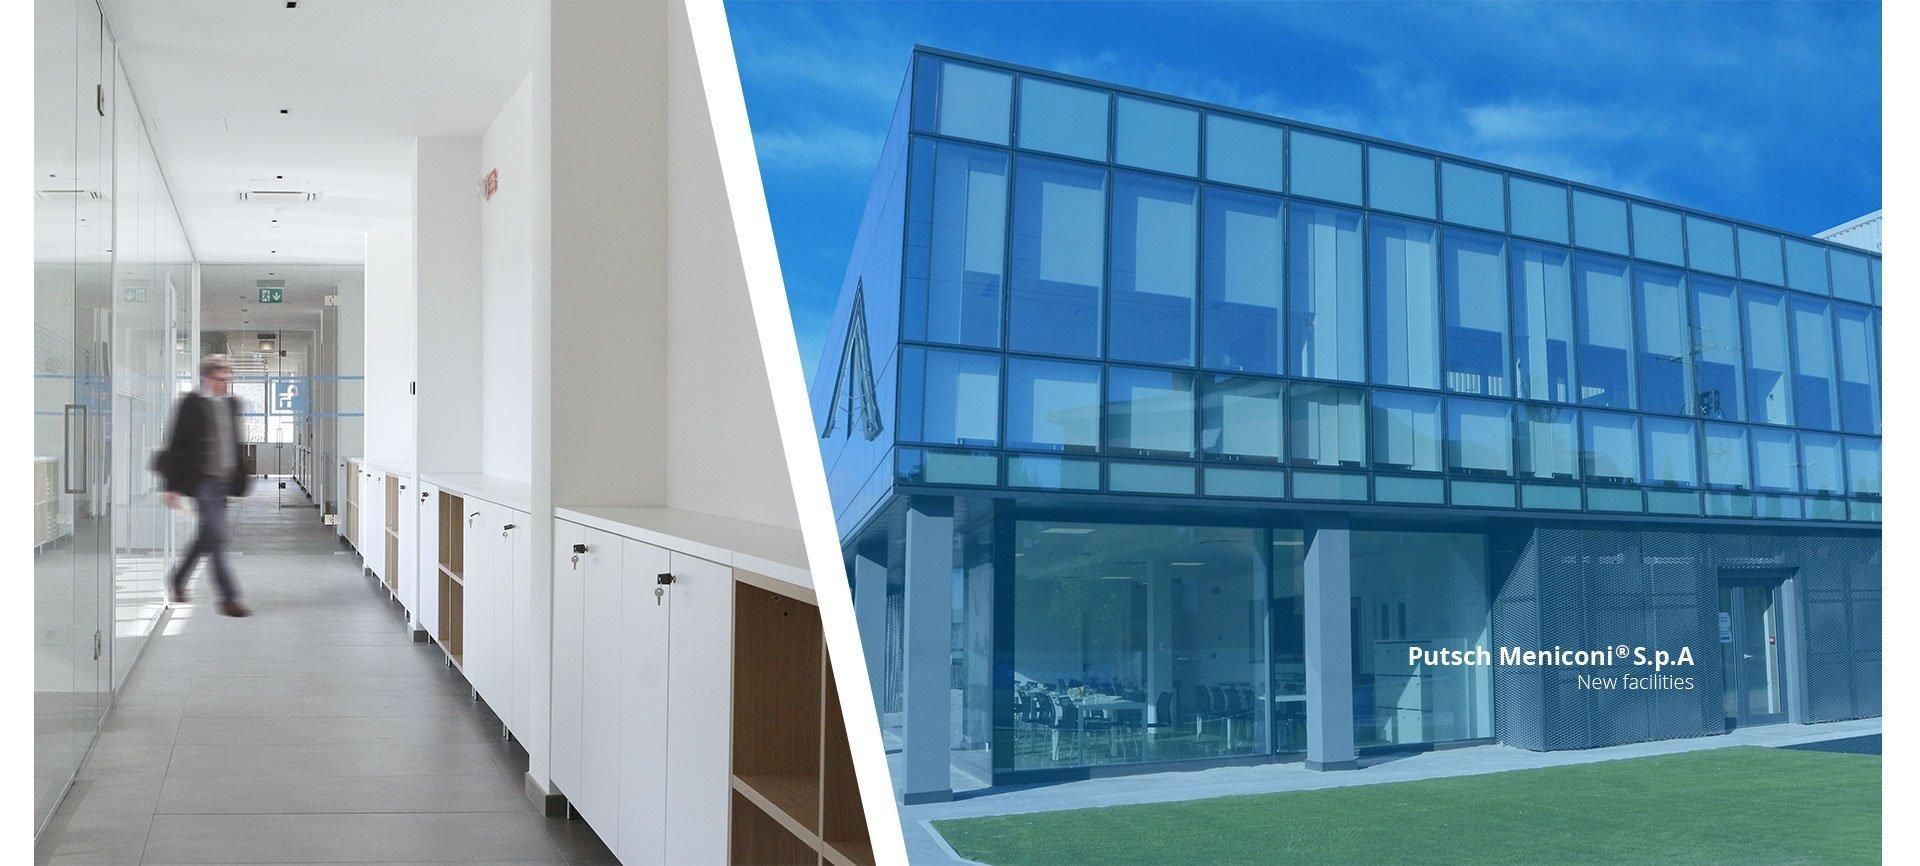 Putsch Meniconi renovates its facilites